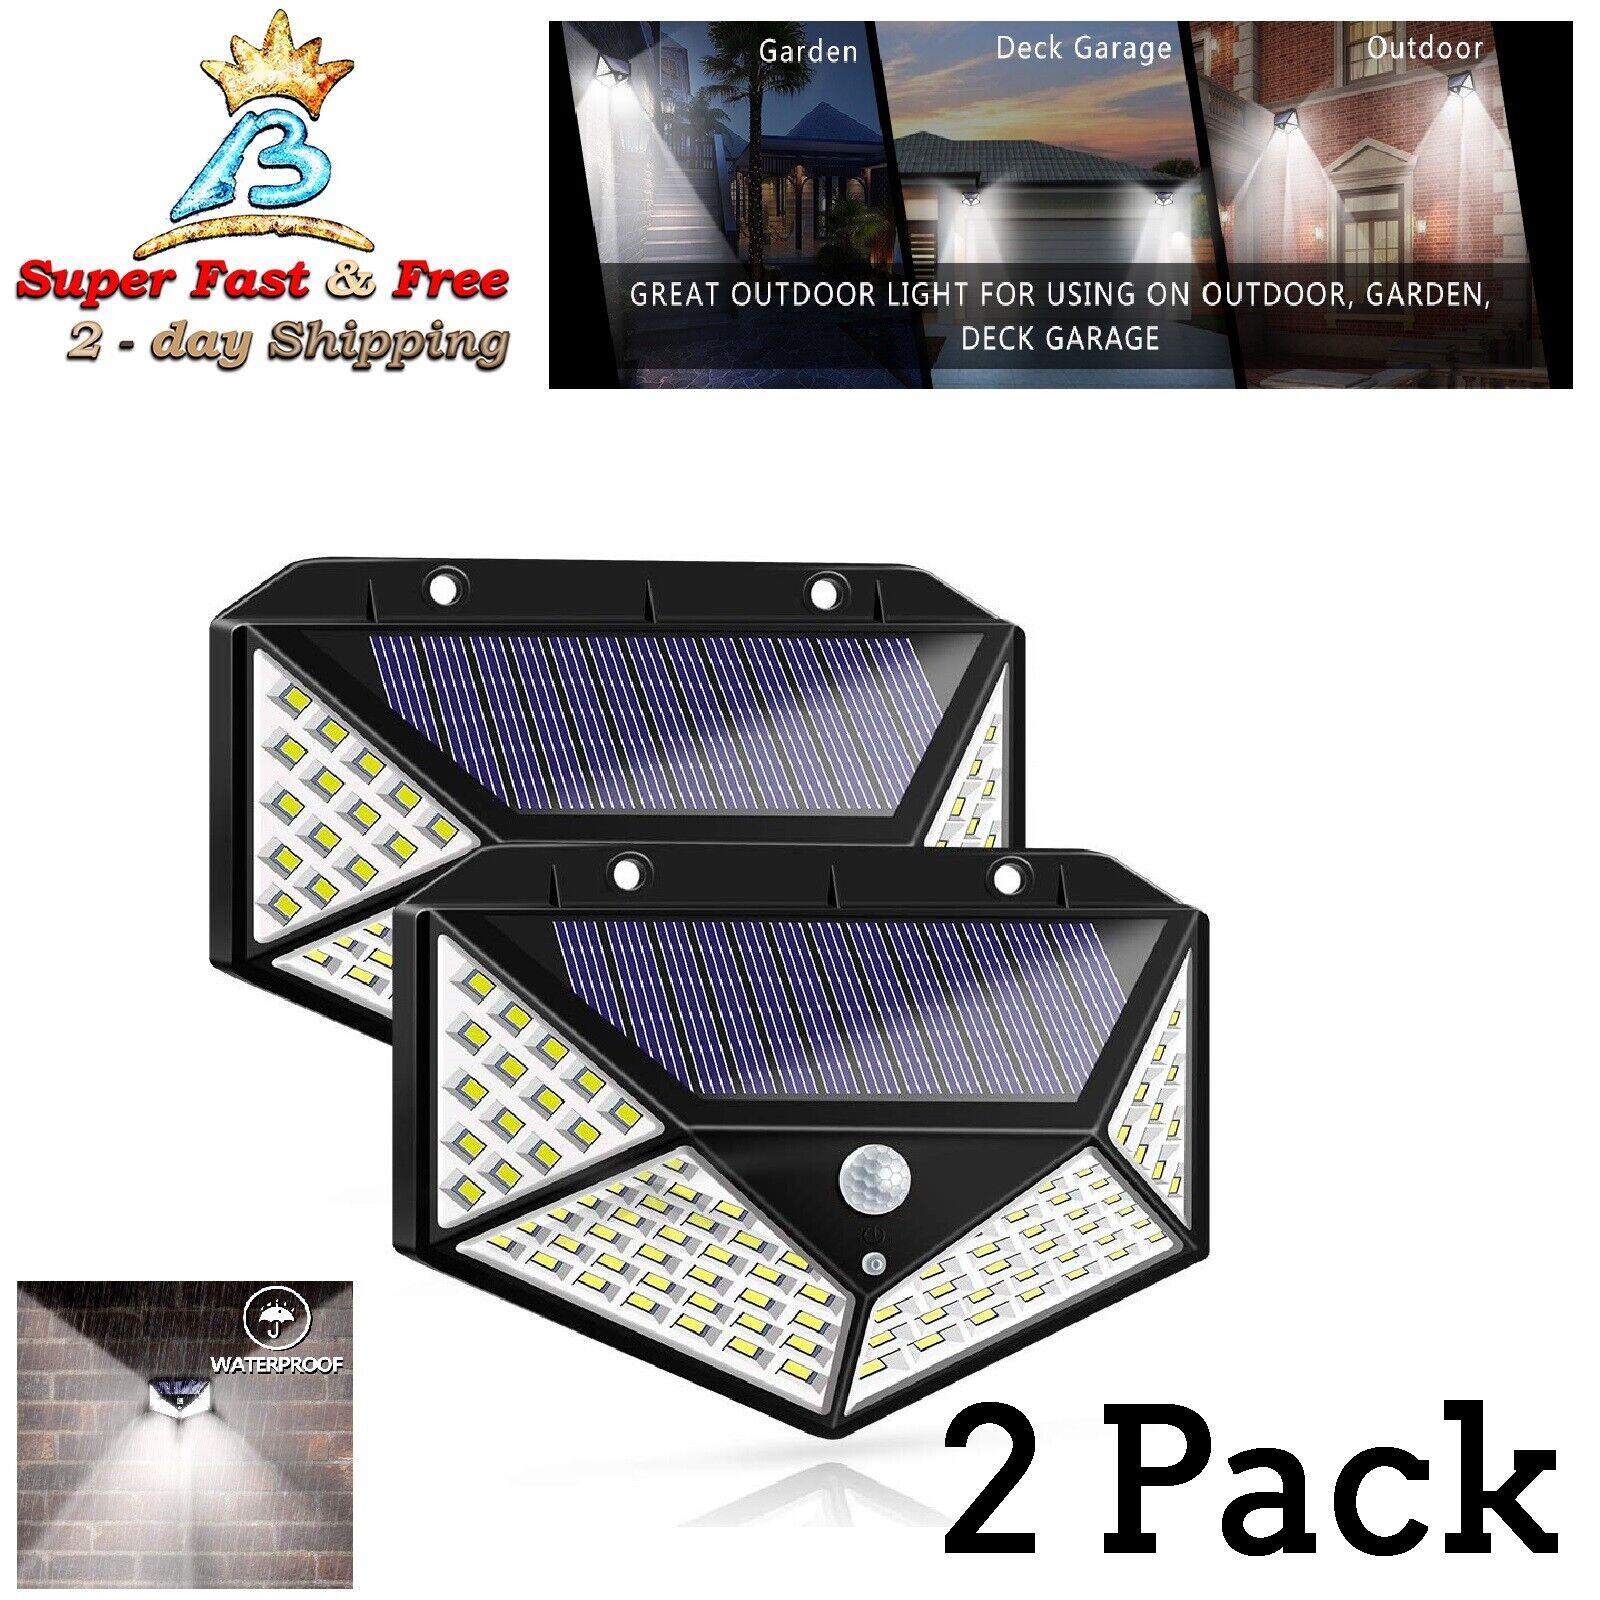 Luces de Seguridad de Instalacion F/ácil con Cable 16,4 Feet// 5 m con Panel Solar 2 Luces Solares Exterior Luz de L/ámpara Impermeable de 100 LED de Pared de Inducci/ón de Cuerpo Humano